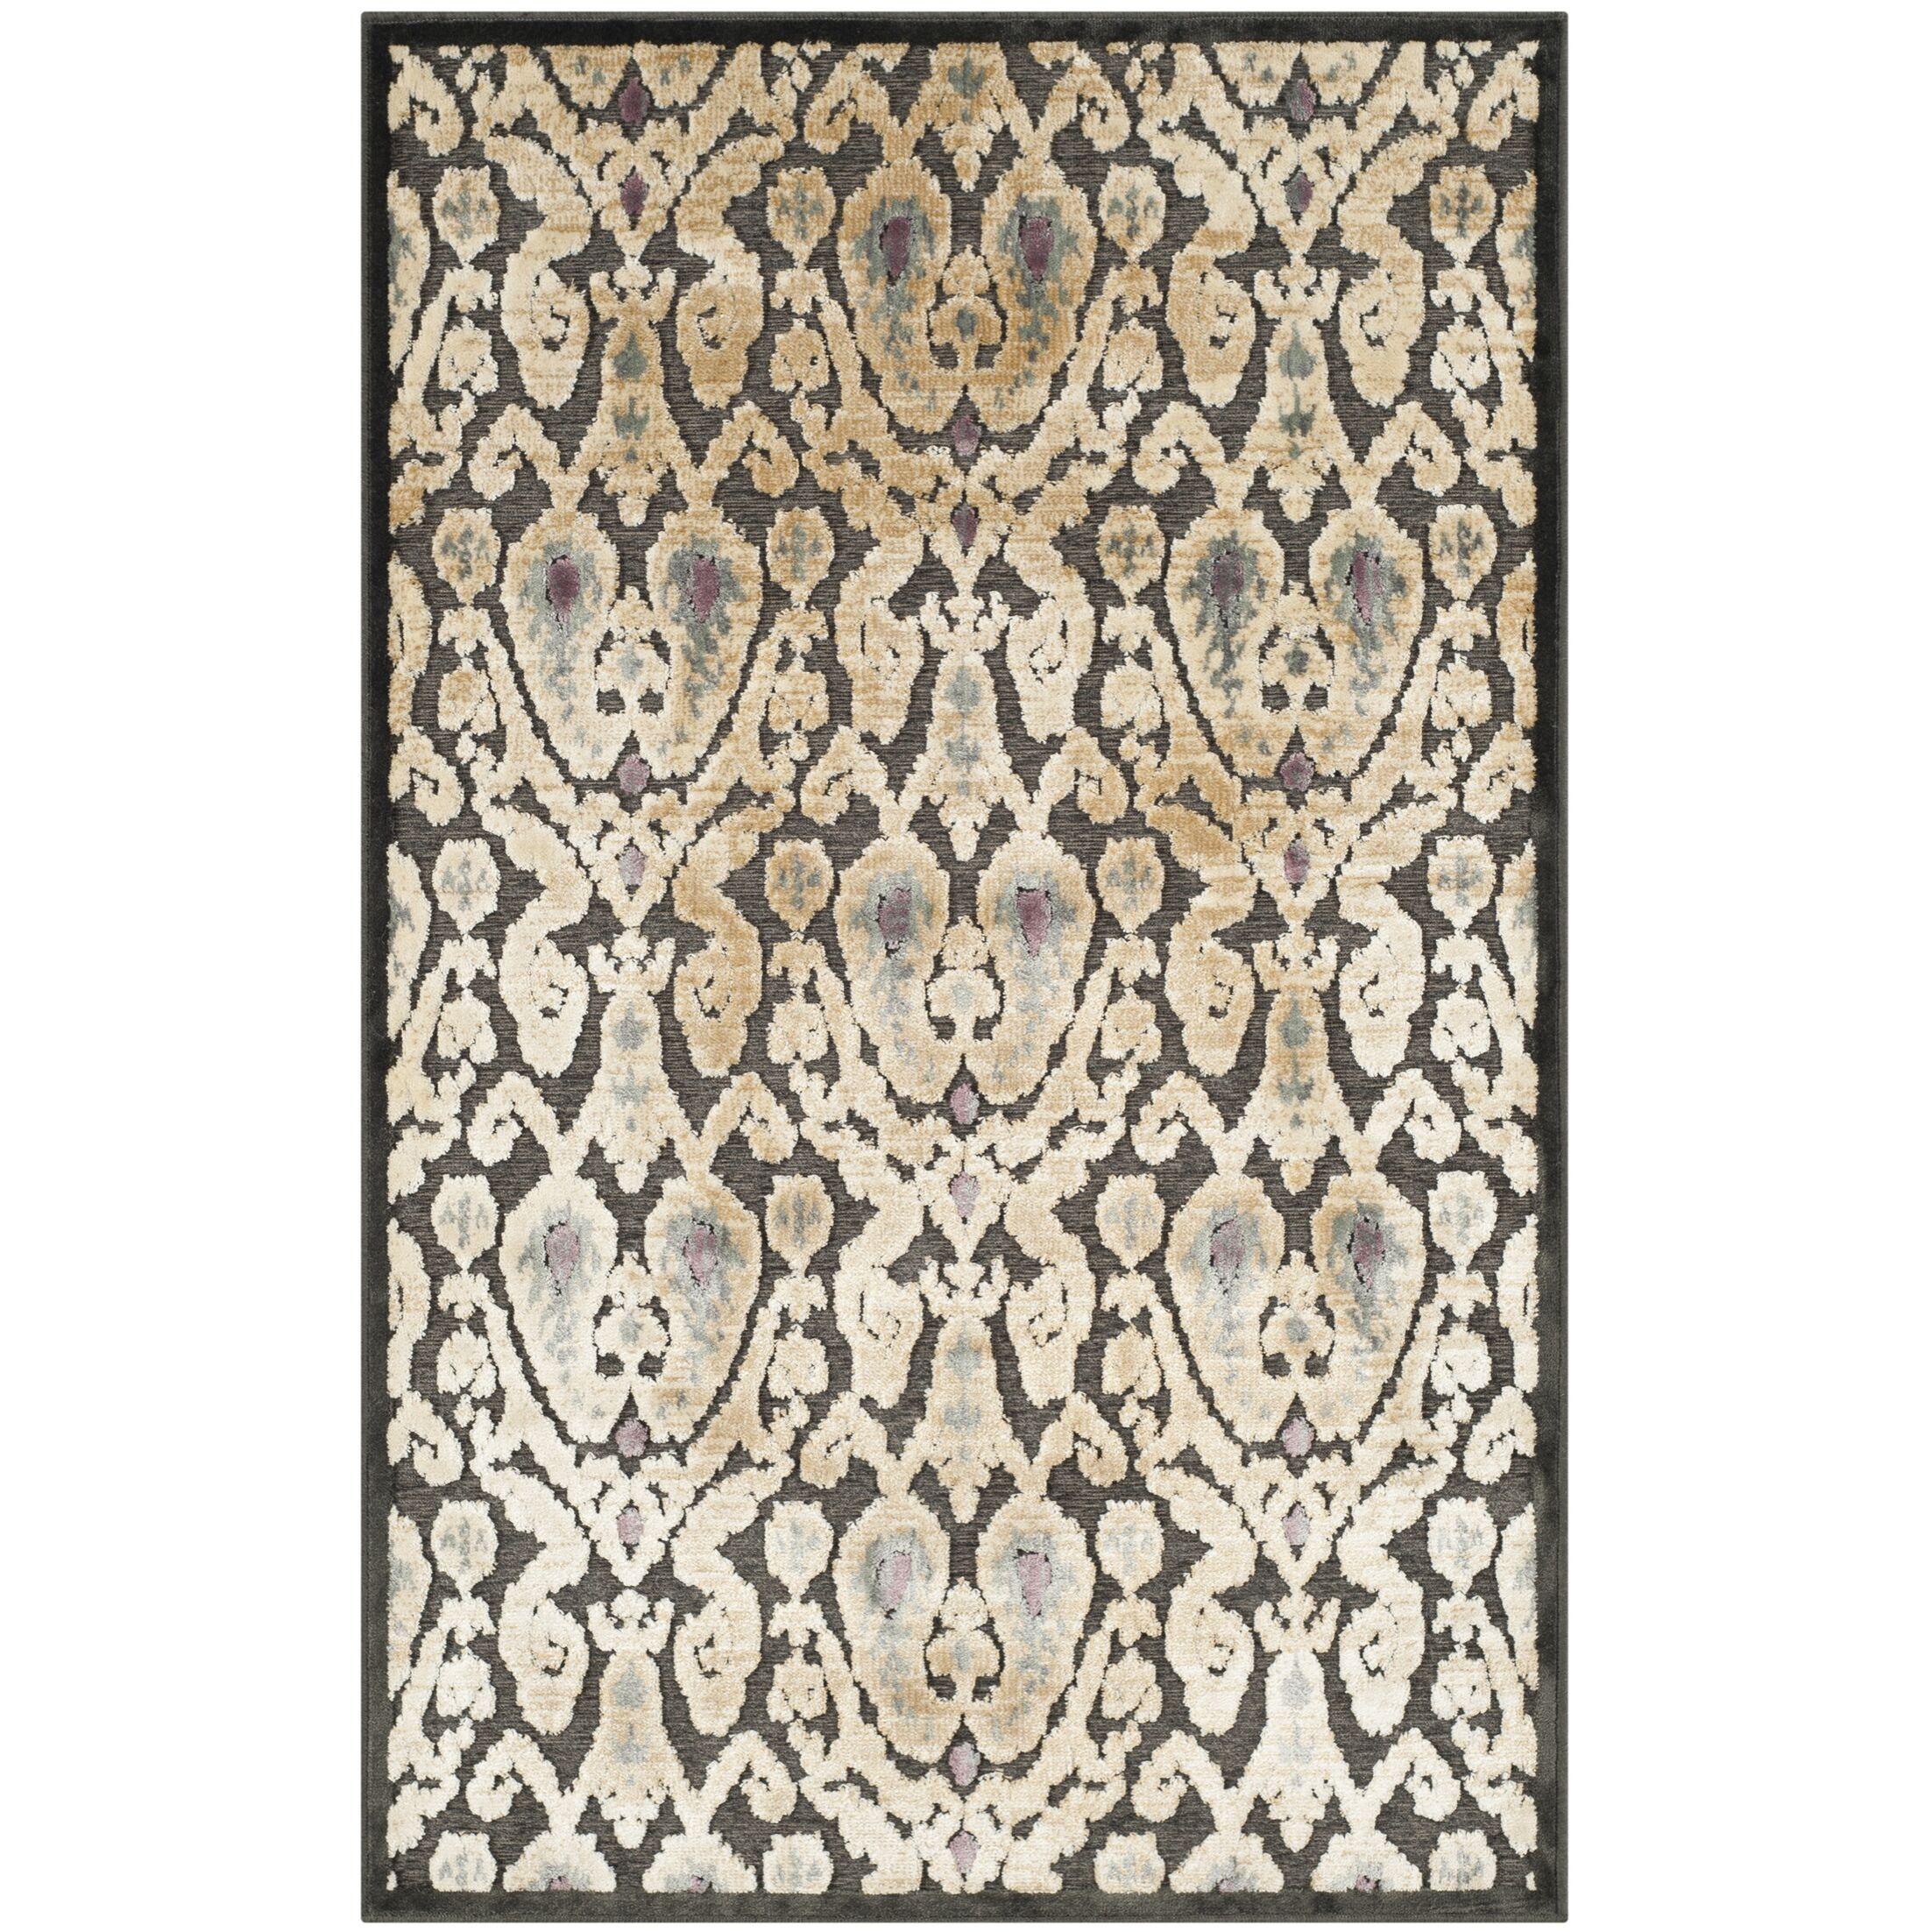 Saint-Michel Black/Gray Rug Size: Rectangle 4' x 5'7